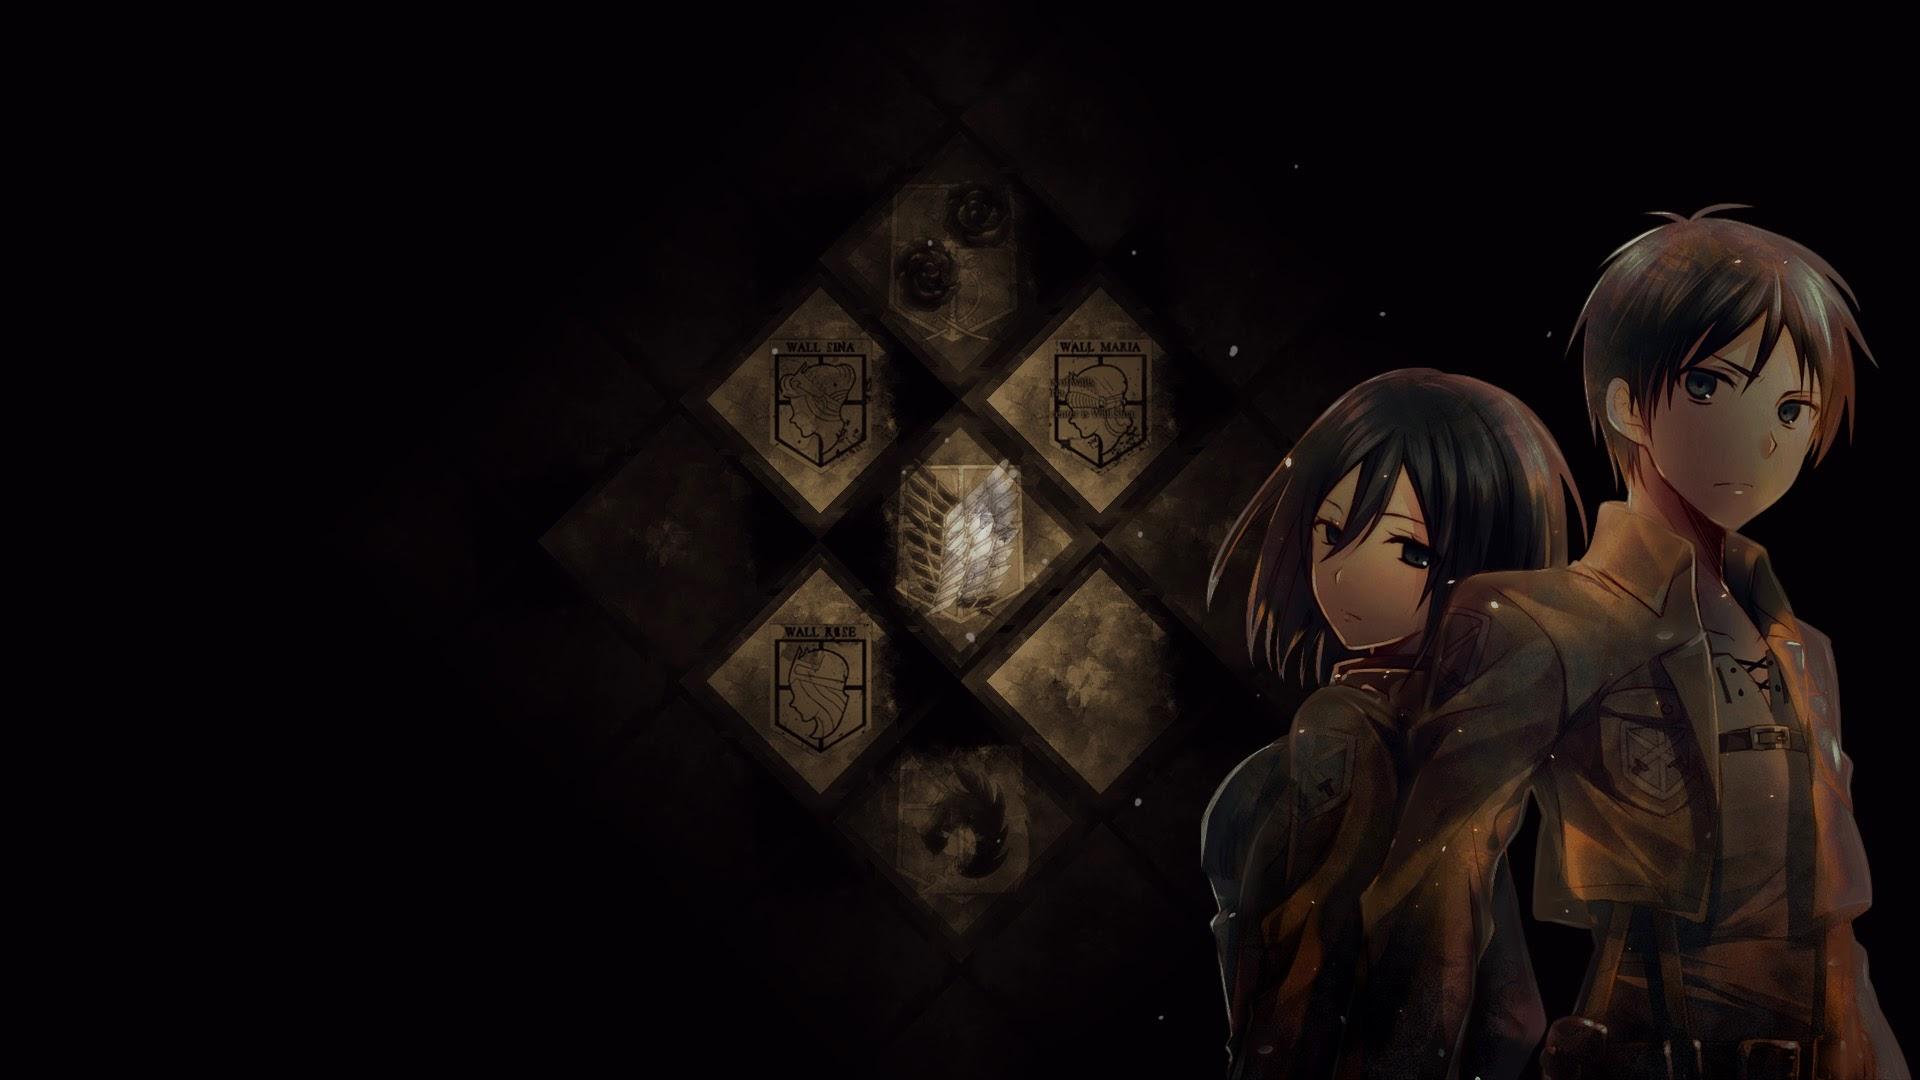 Mikasa and eren anime picture 93 wallpaper hd mikasa ackerman and eren jaeger attack on titan shingeki no kyojin 1920x1080 93 voltagebd Choice Image